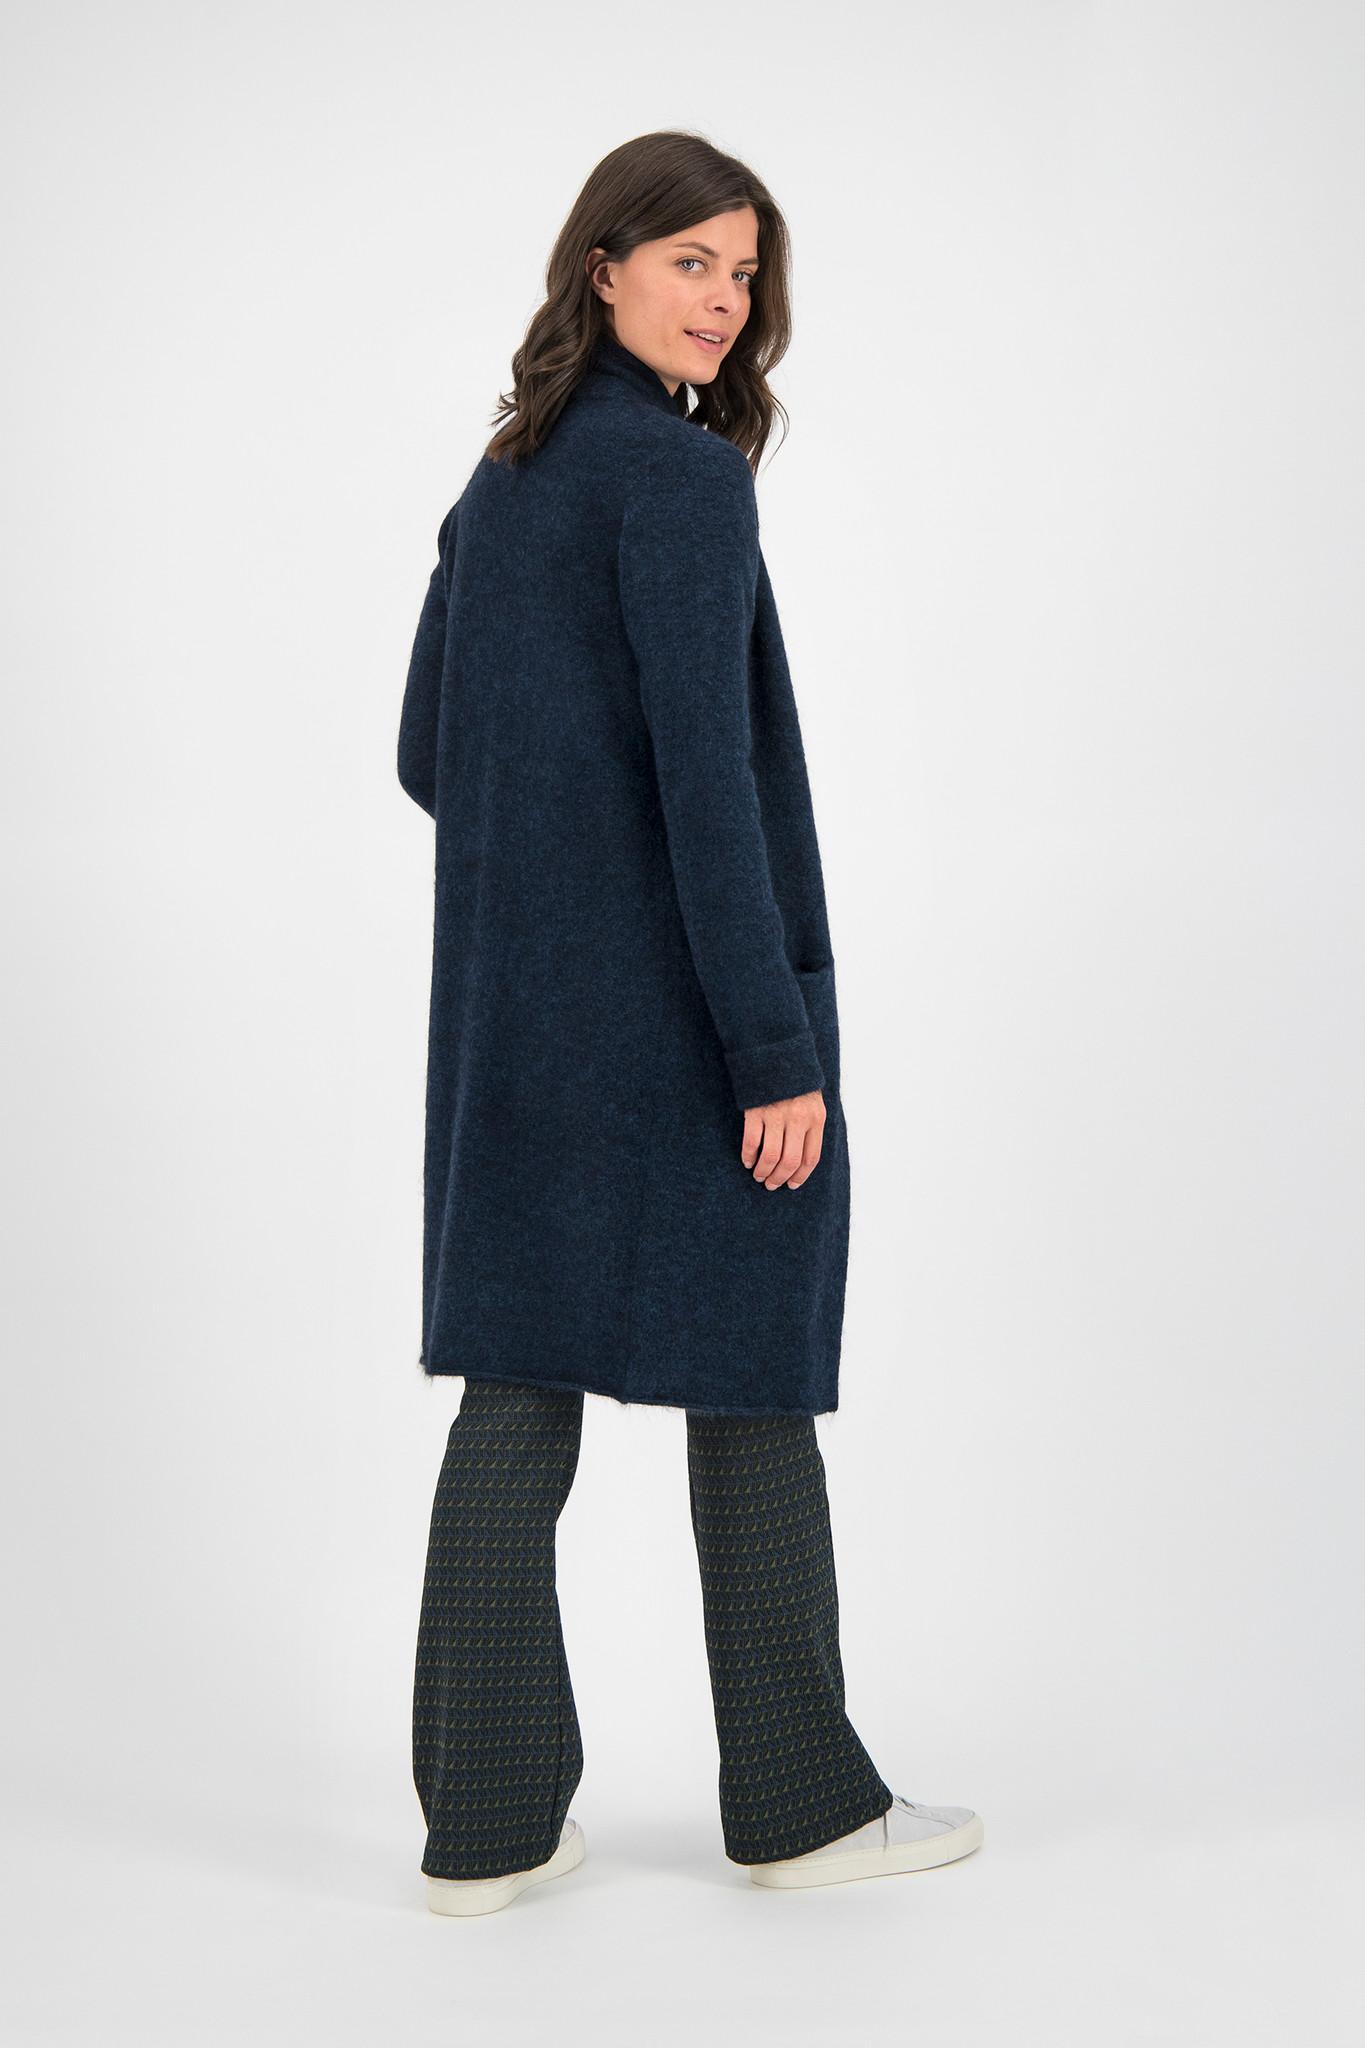 SYLVER Top Line Blazer - Dark Blue